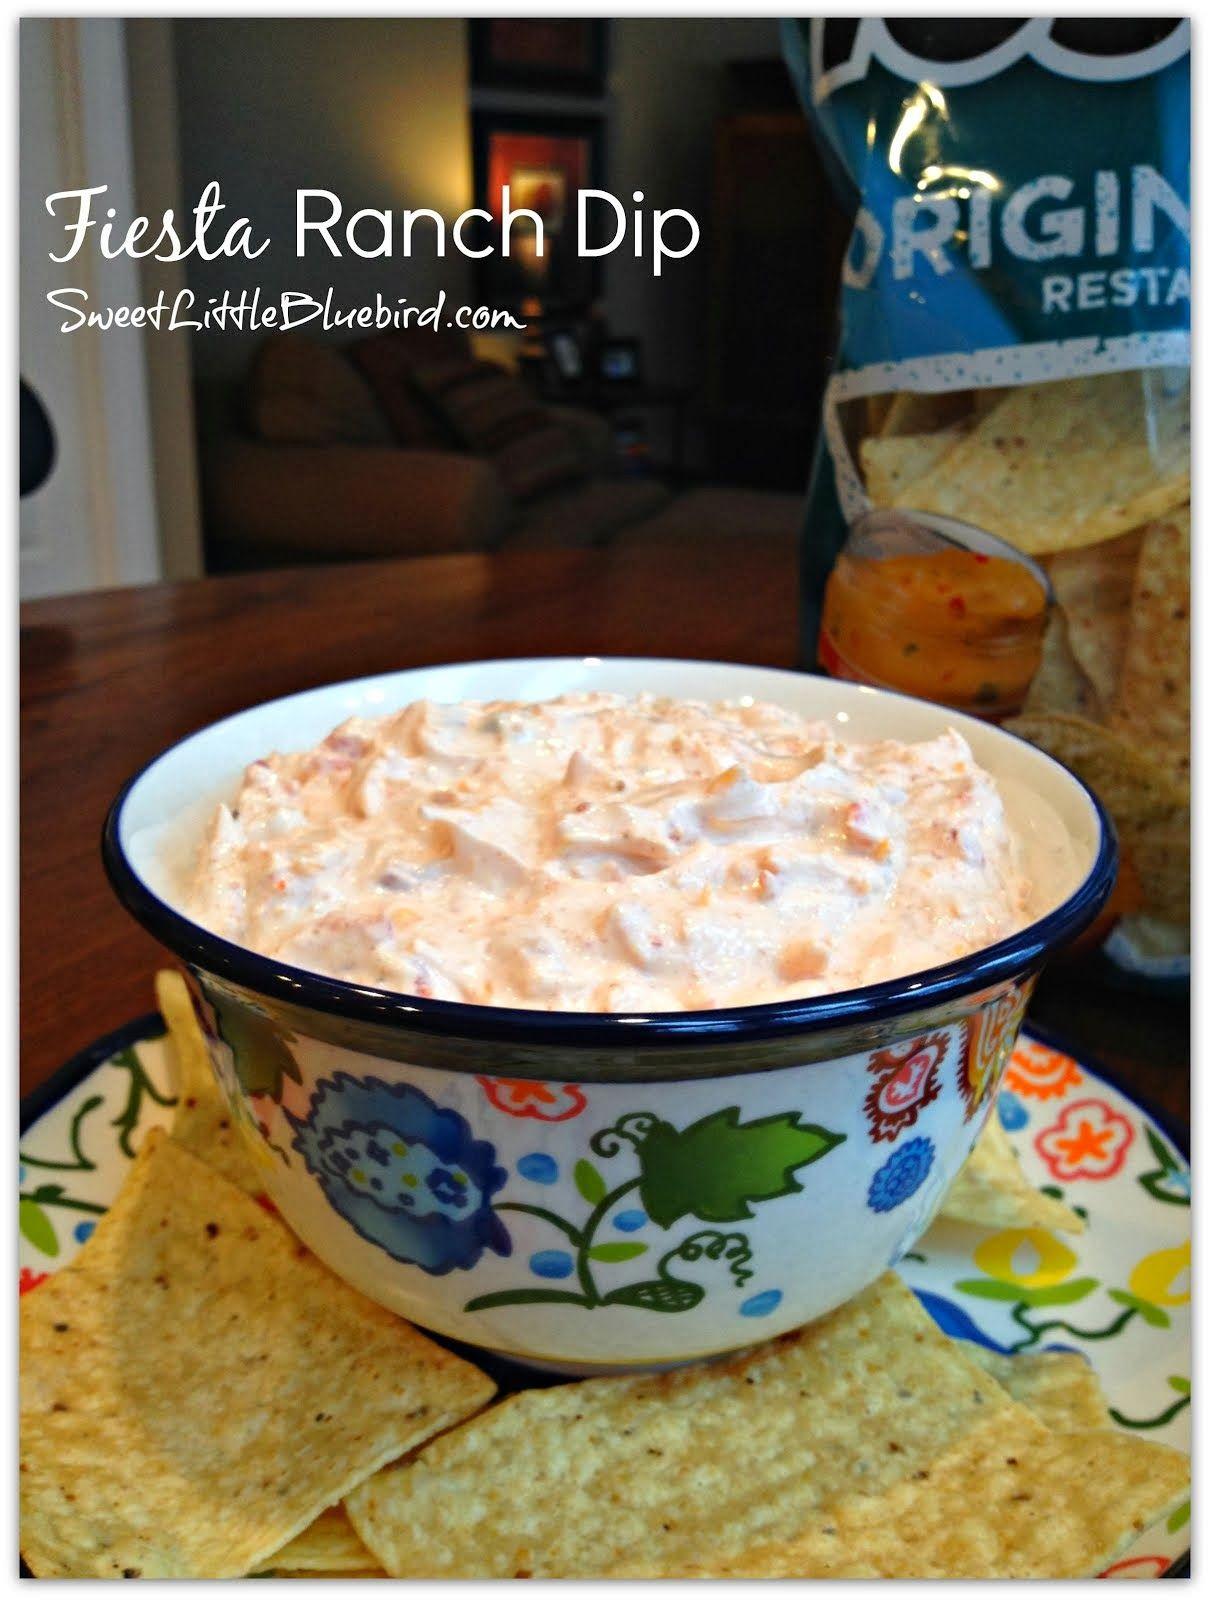 Fiesta Ranch Dip Fiesta Ranch Dip Snacks Yummy Dips